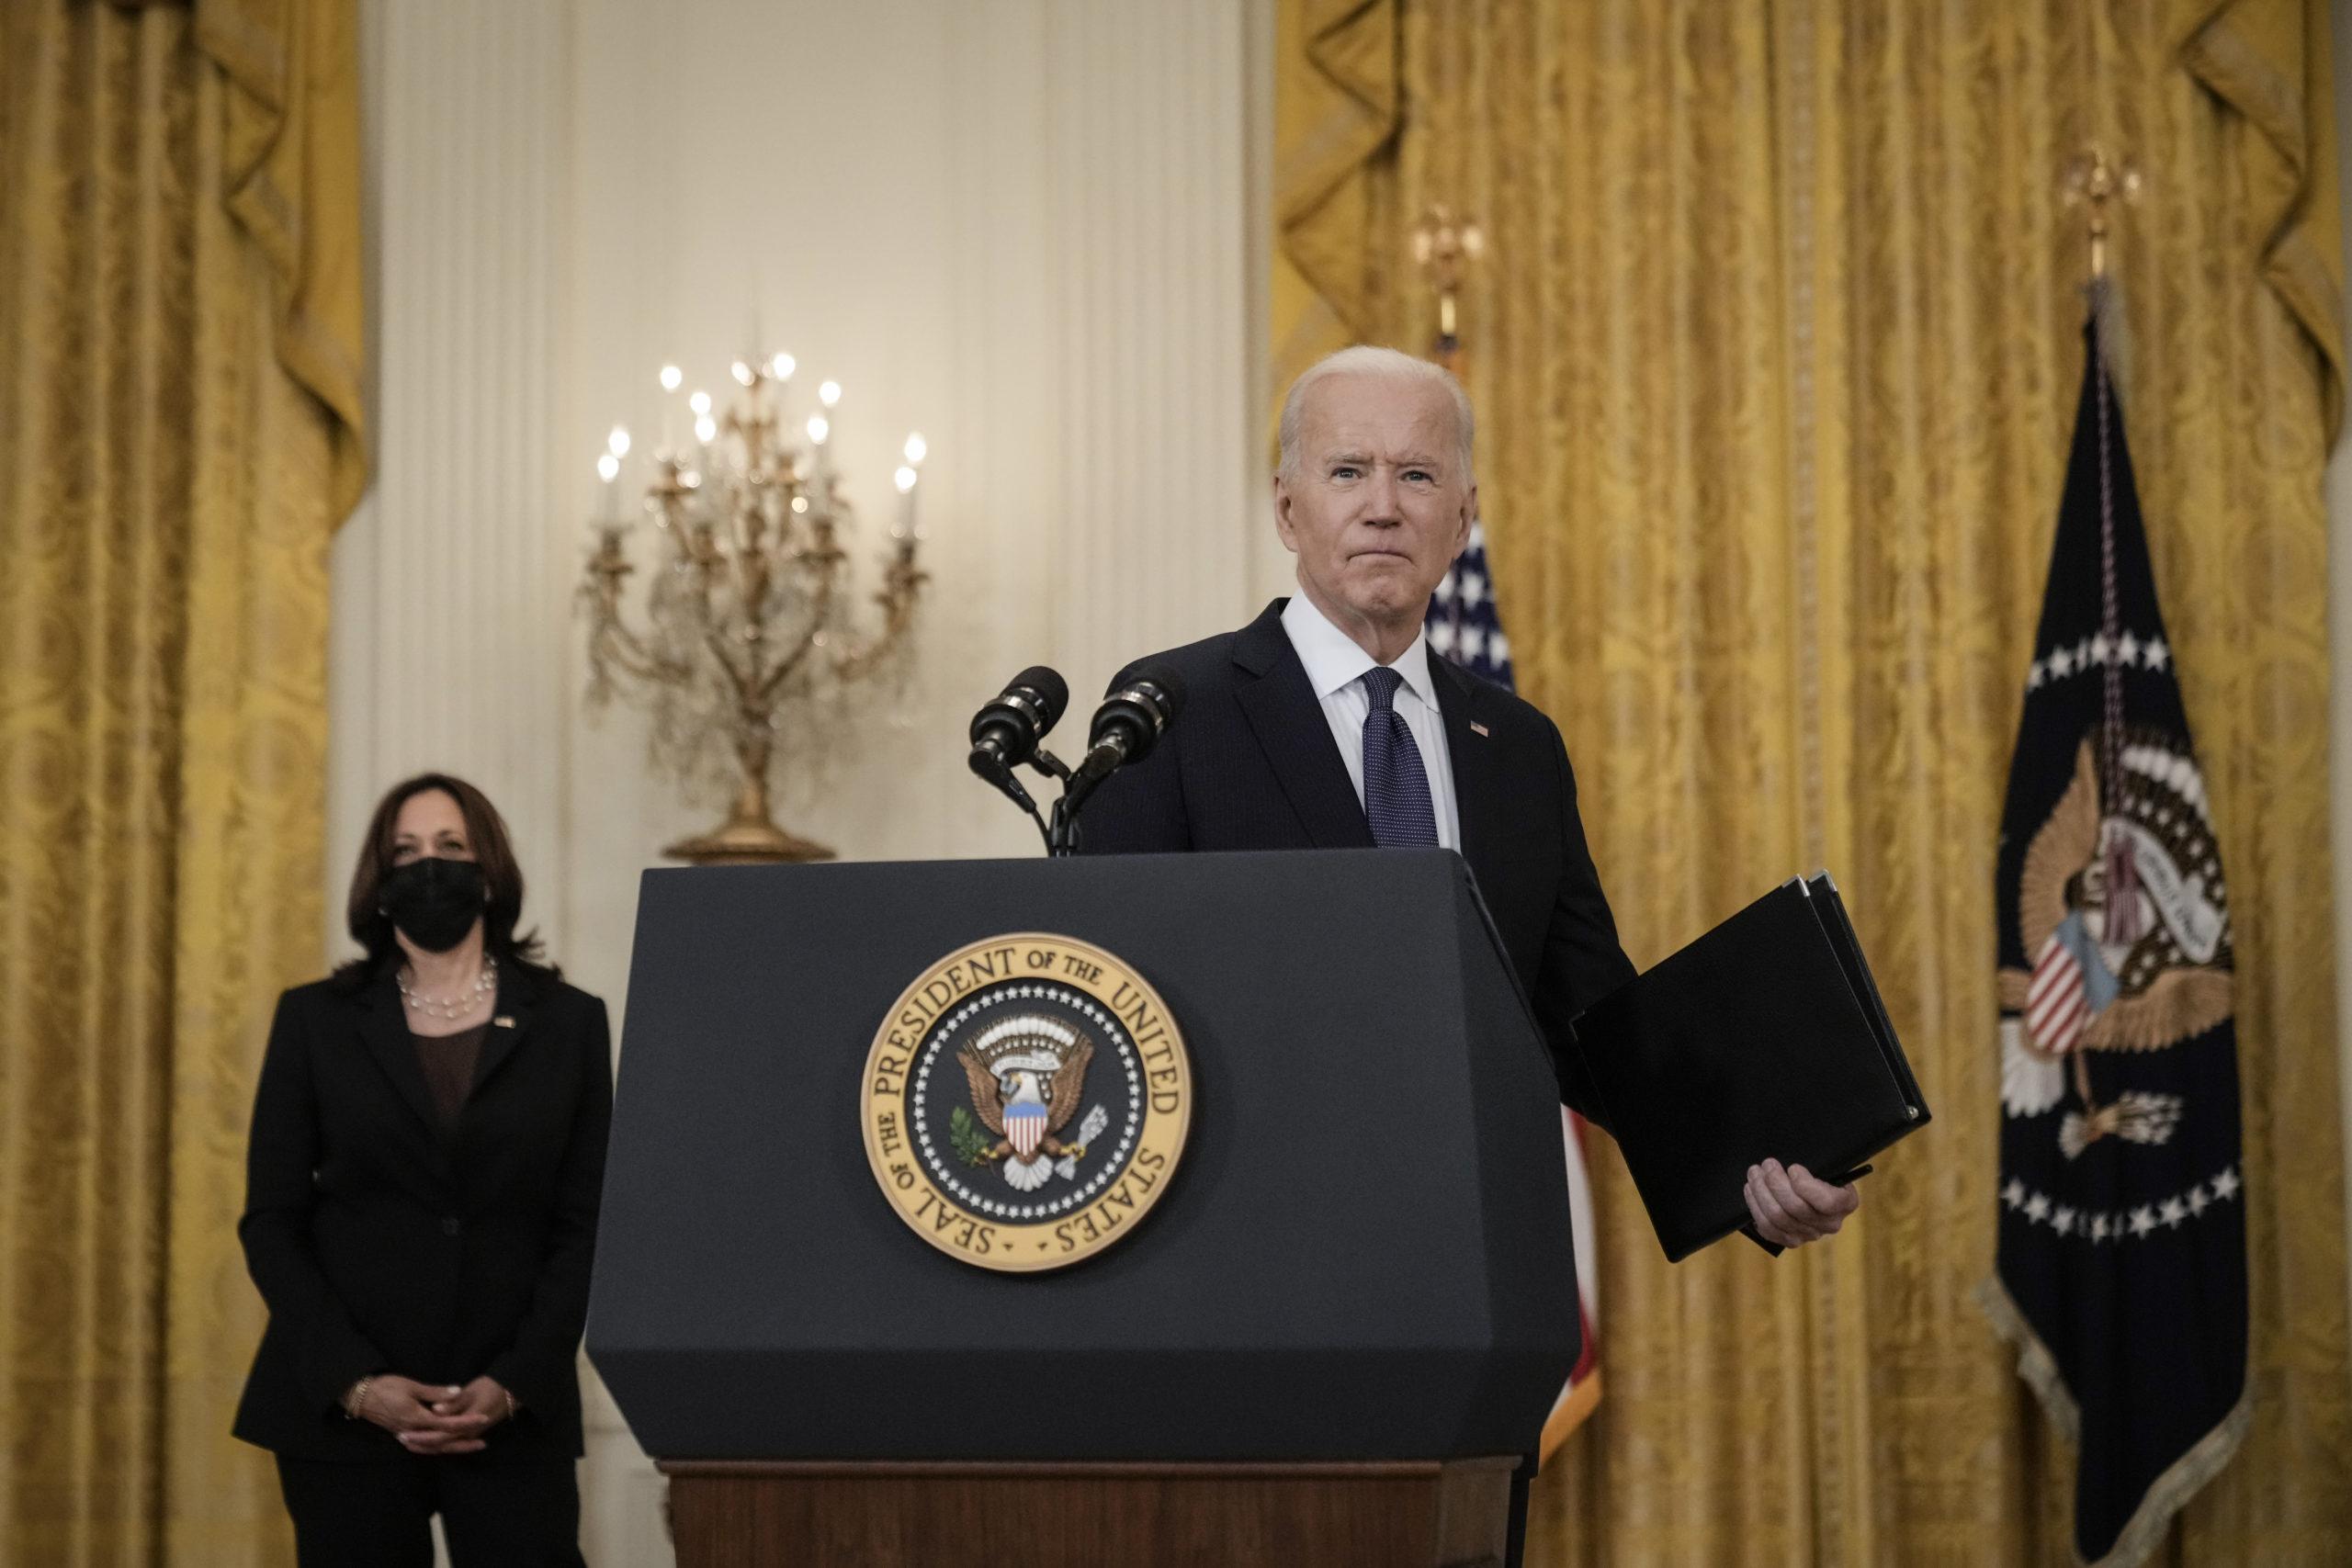 President Joe Biden departs after delivering remarks on the economy on Monday. (Drew Angerer/Getty Images)